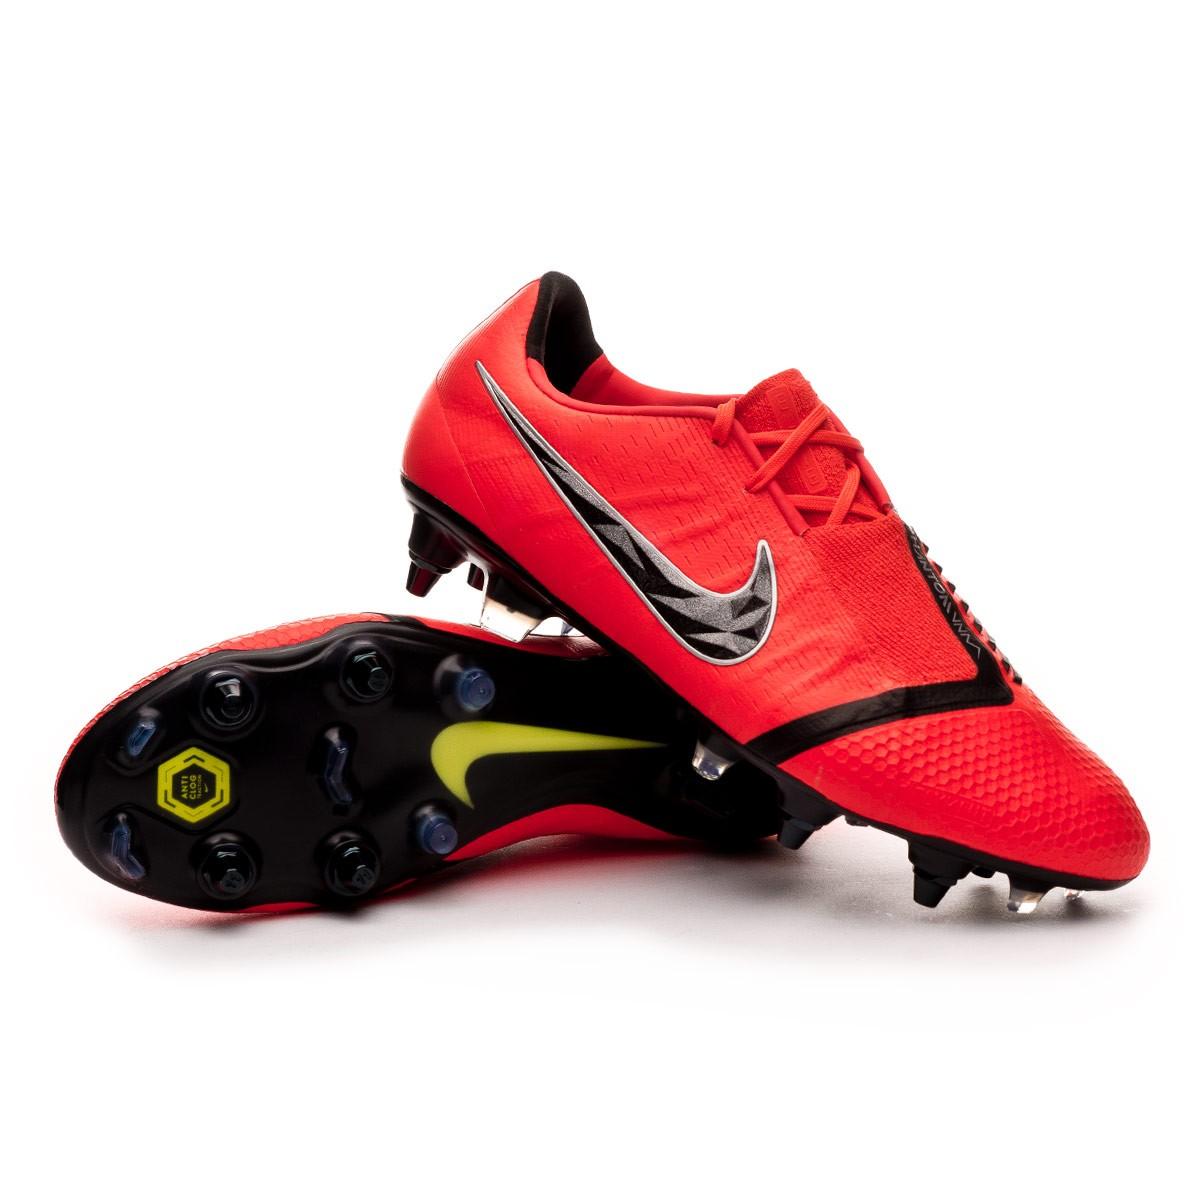 6a25764c3a4d Nike Phantom Venom Elite SG-Pro ACC Football Boots. Bright crimson-Black ...